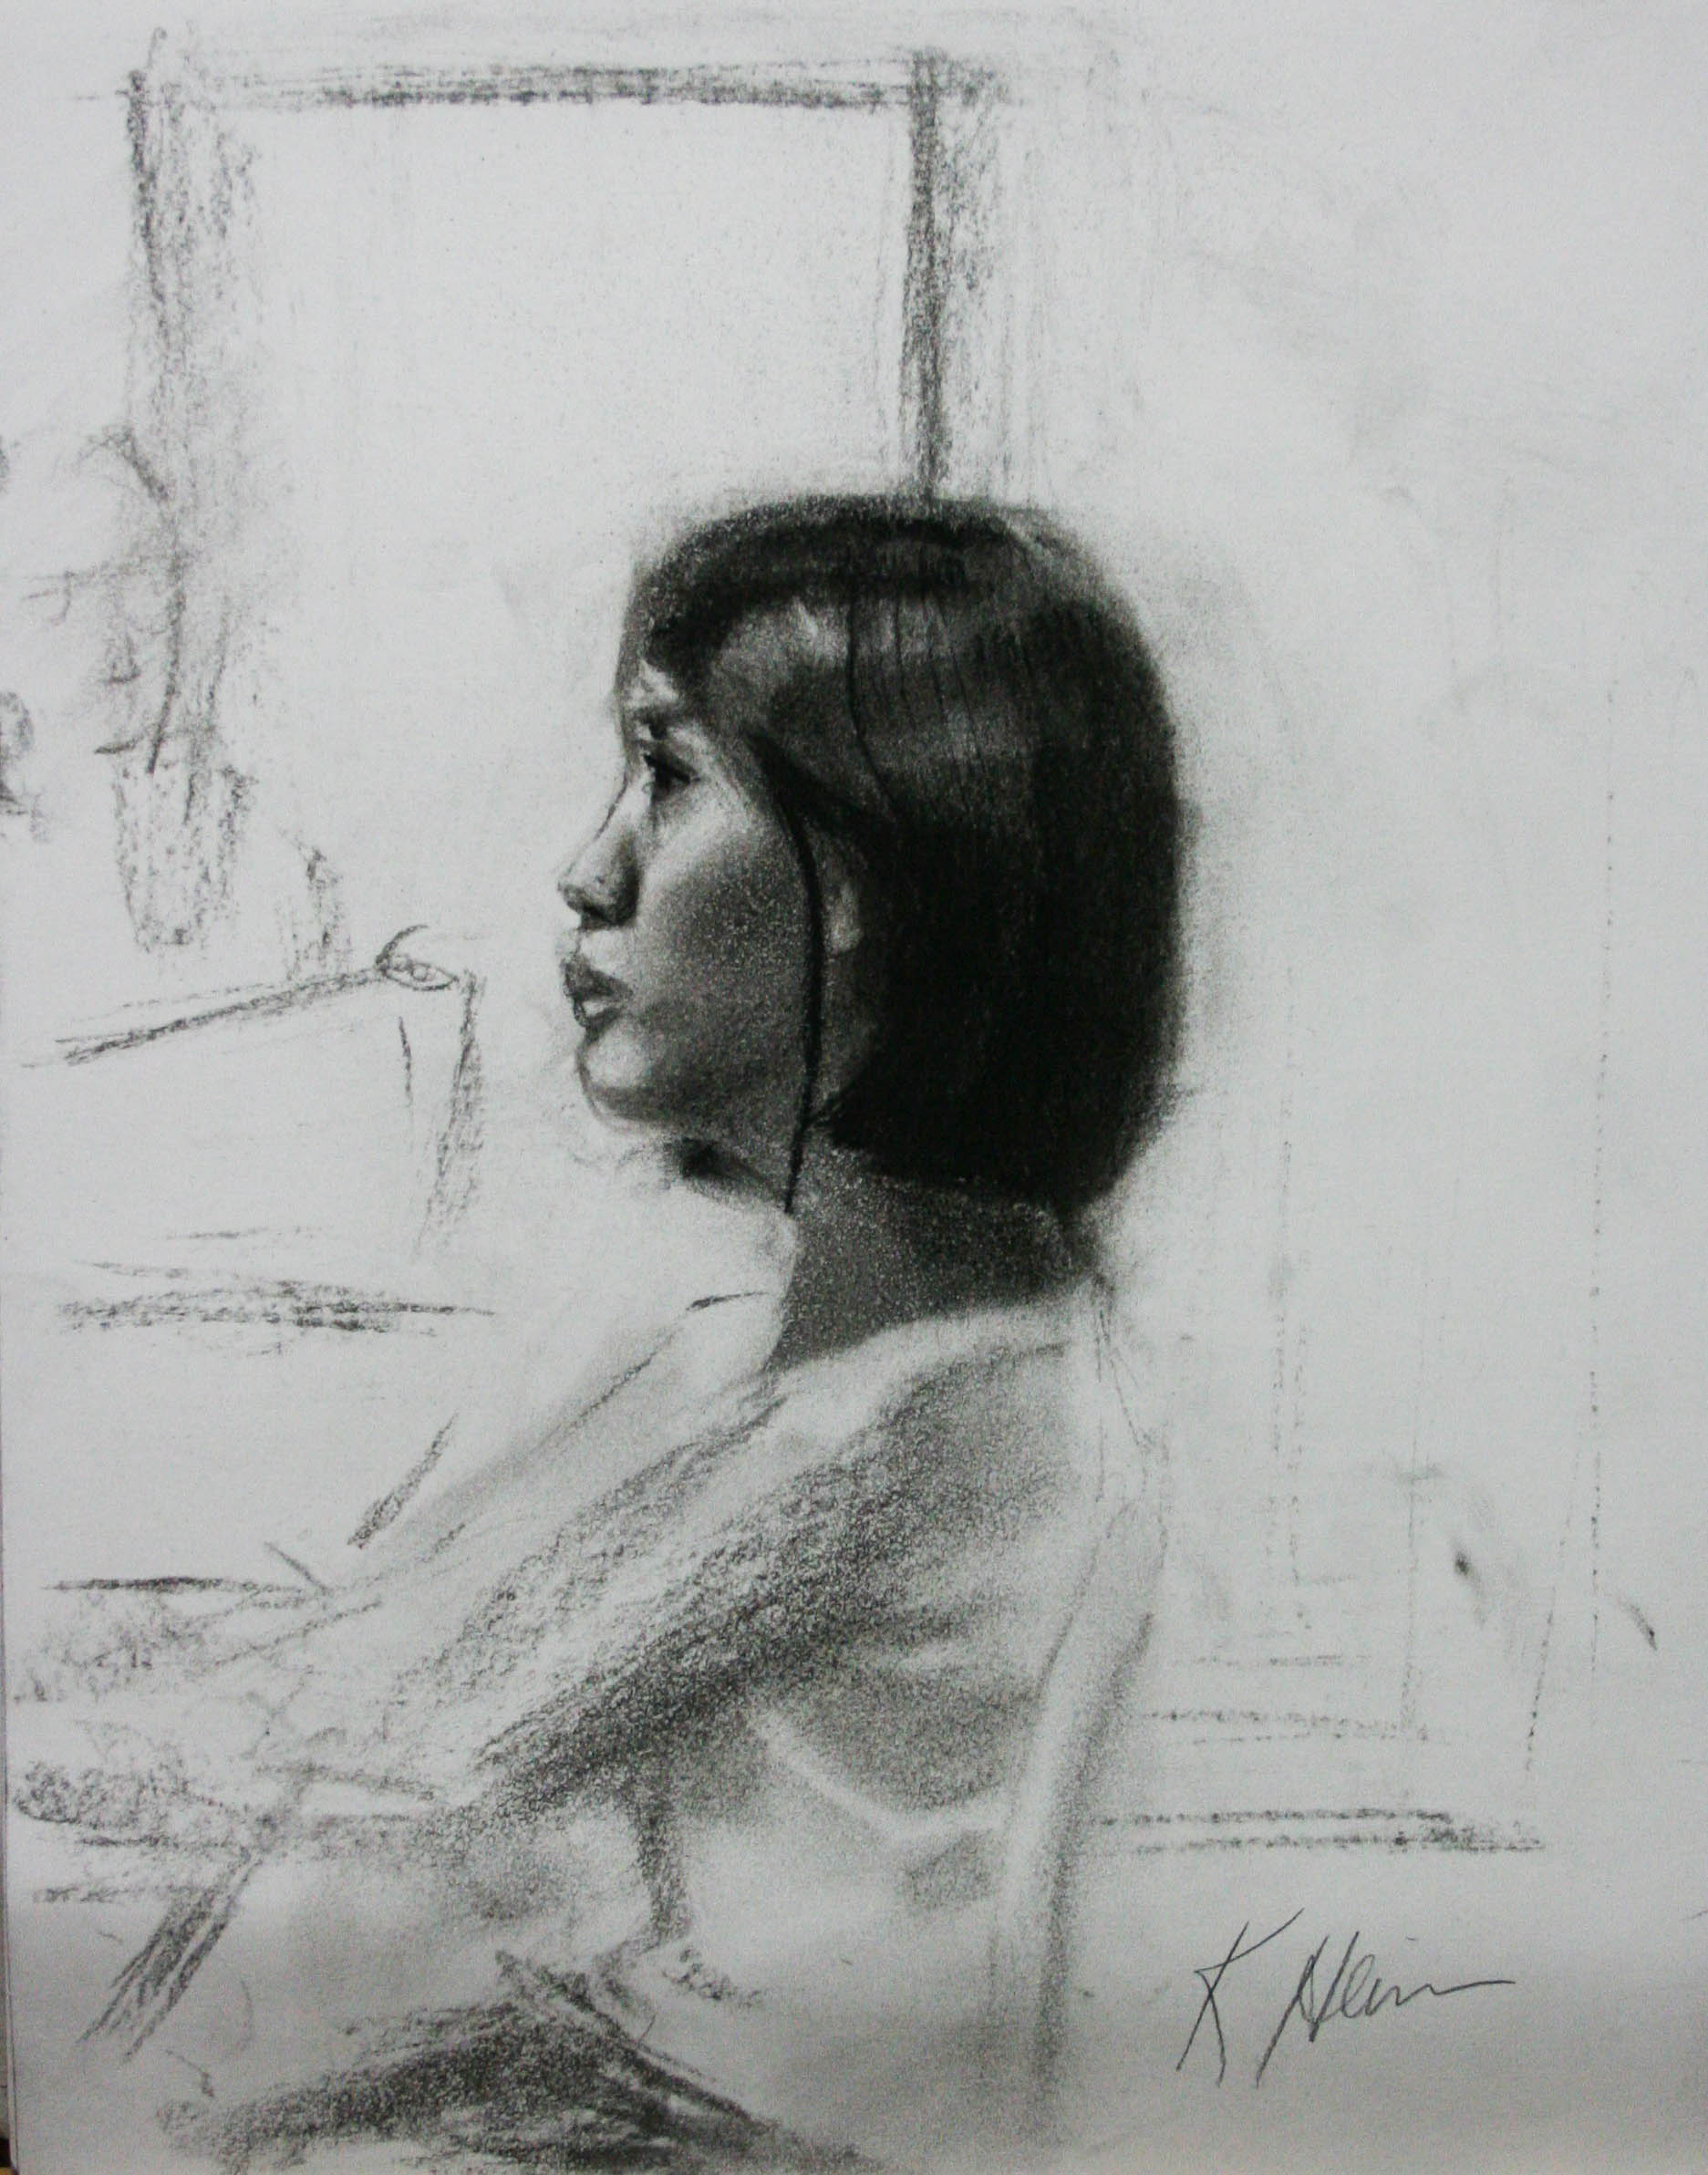 Kathryn Heim did this half hour sketch.